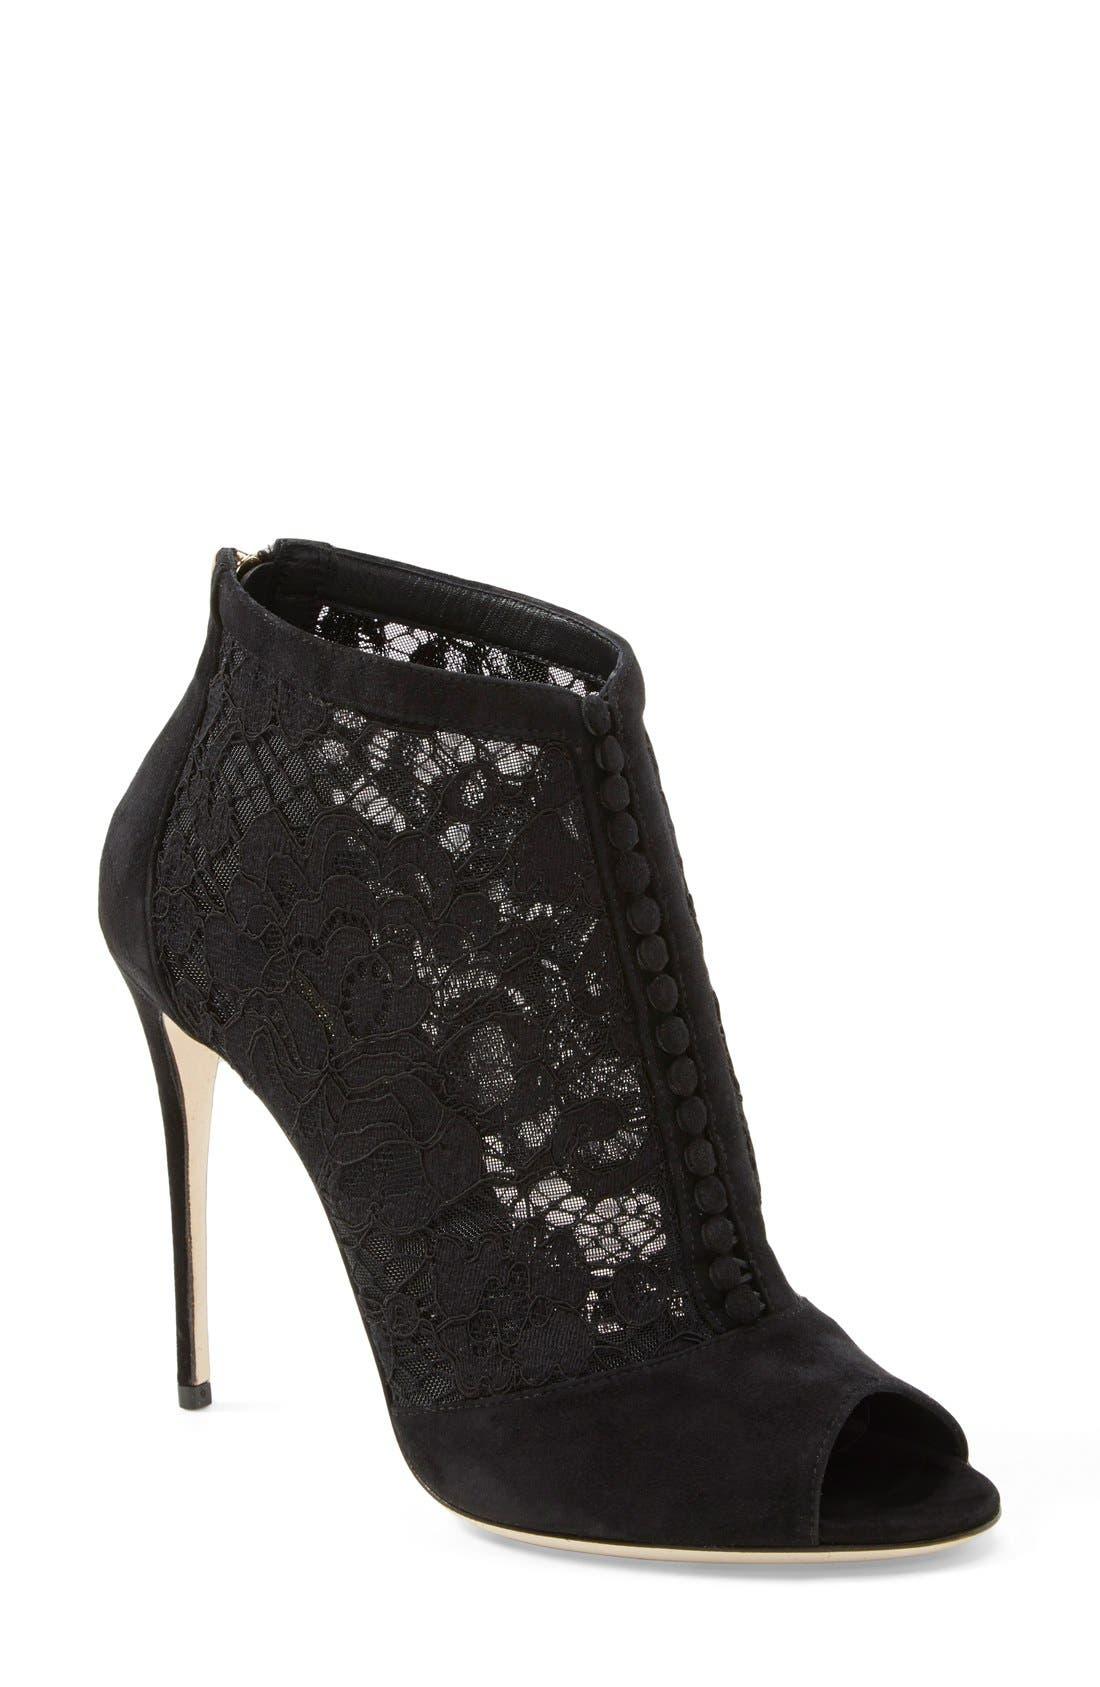 Main Image - Dolce&Gabbana Peep Toe Bootie (Women)